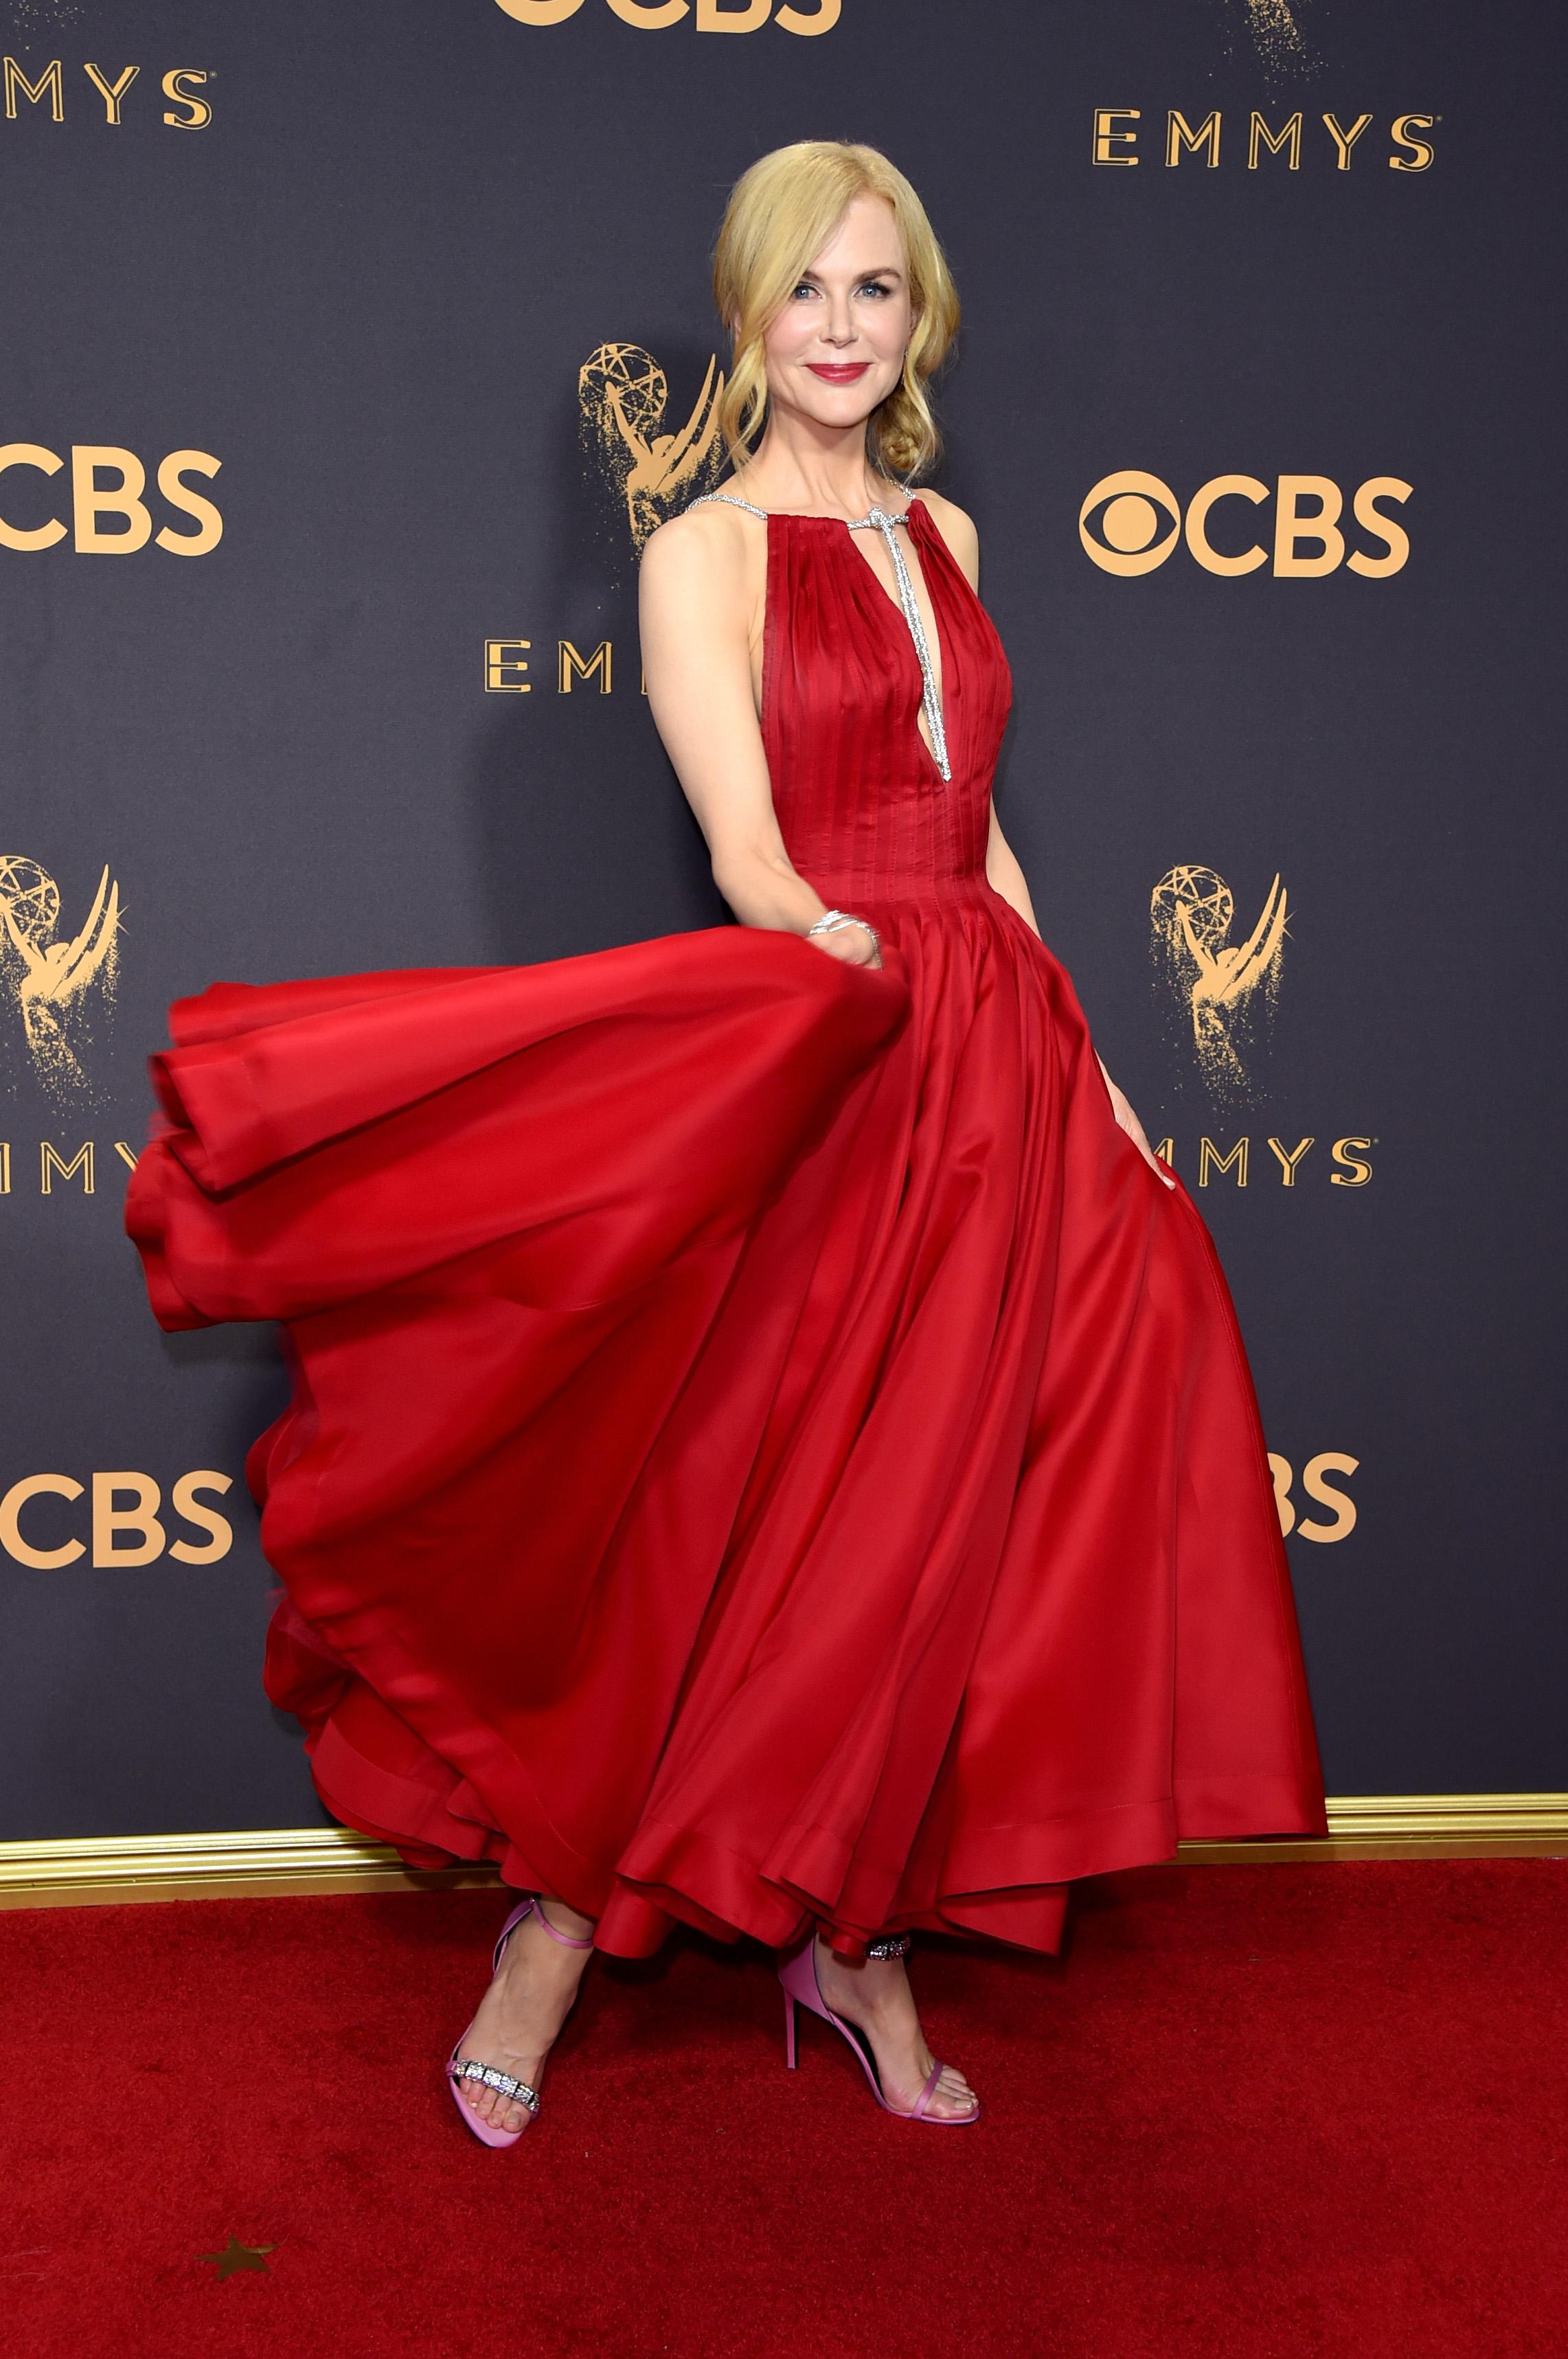 Nicole Kidman Emmys Red Carpet 2017